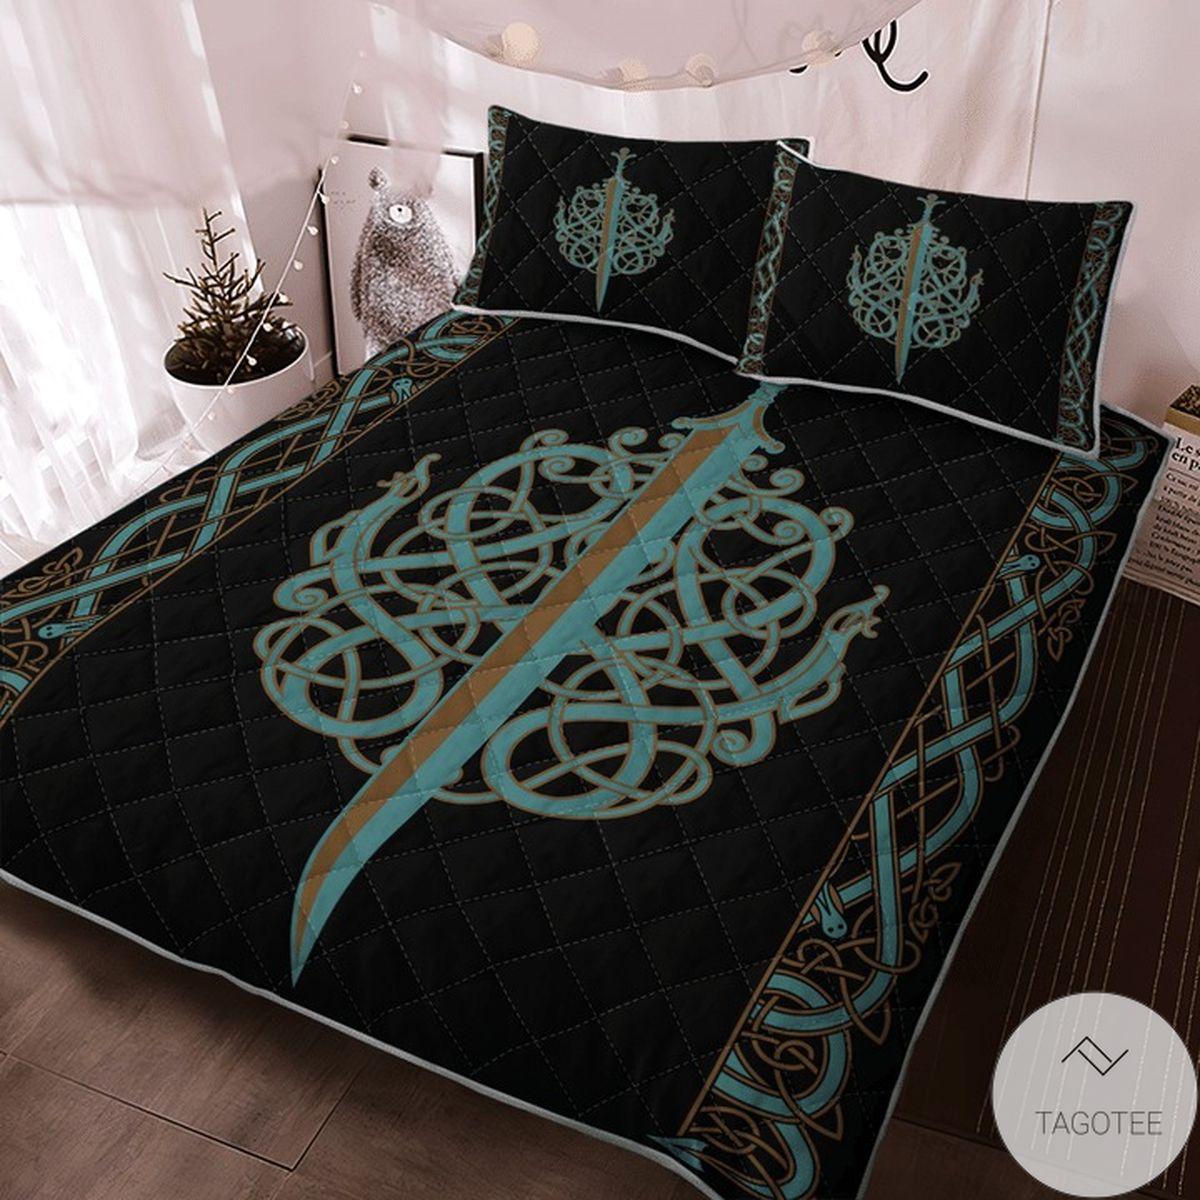 eBay The Ulfberht Swords Viking Quilt Bedding Set